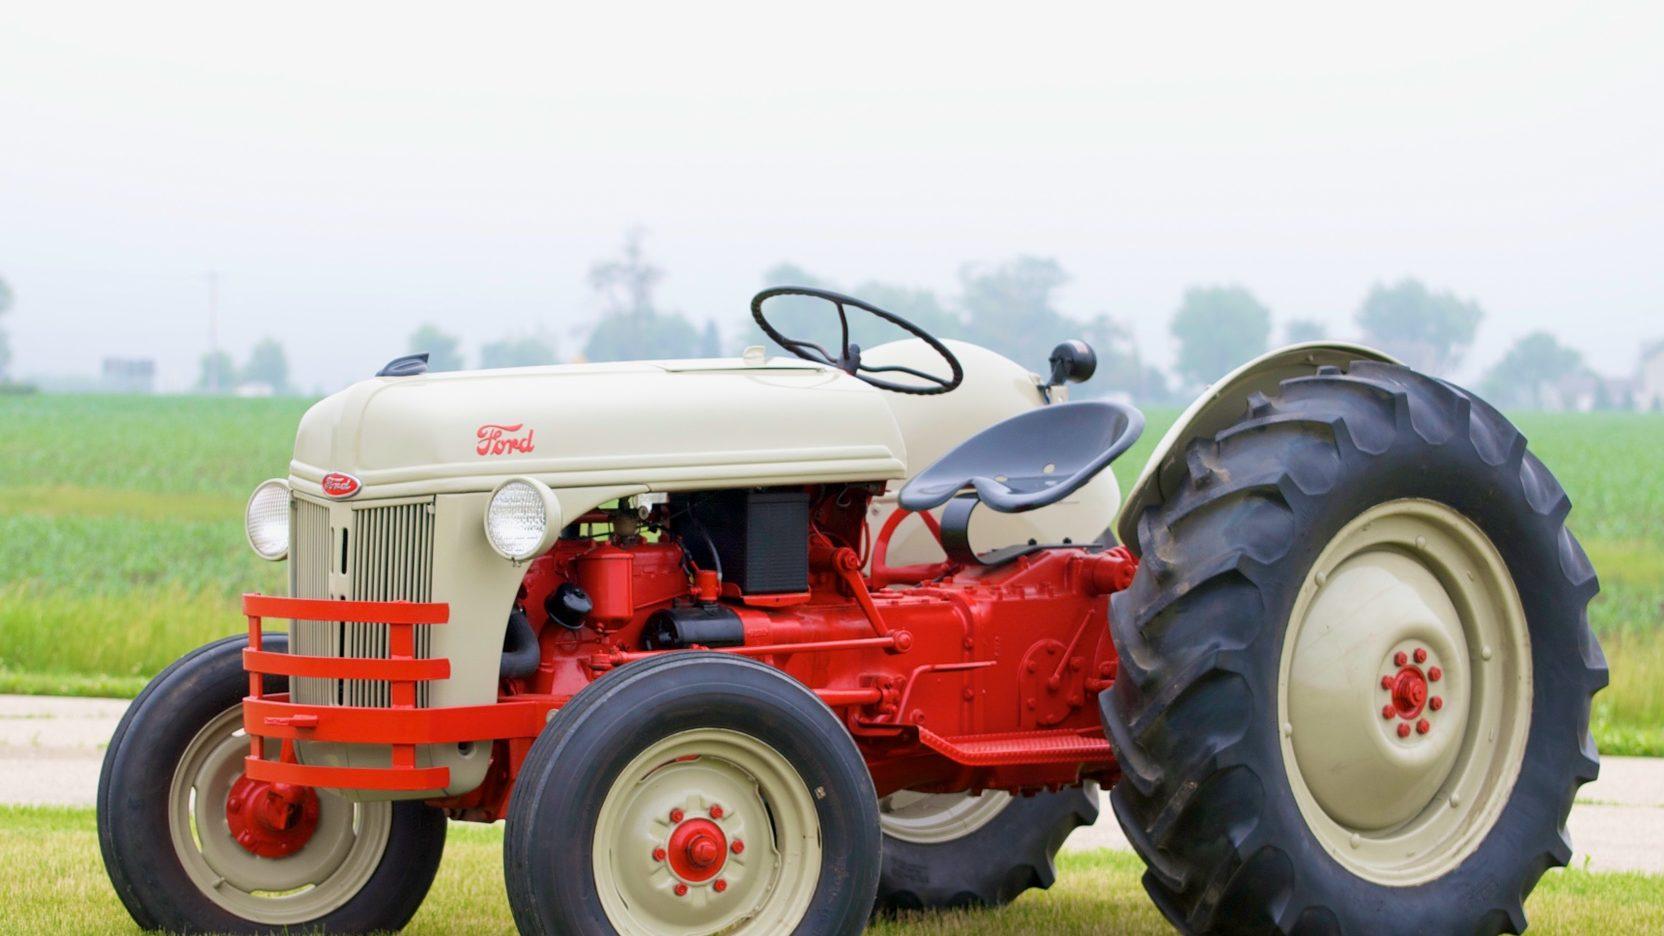 ford 8n tractor 2003 chevy tahoe radio wiring diagram 1948 s59 gone farmin 39 summer 2011